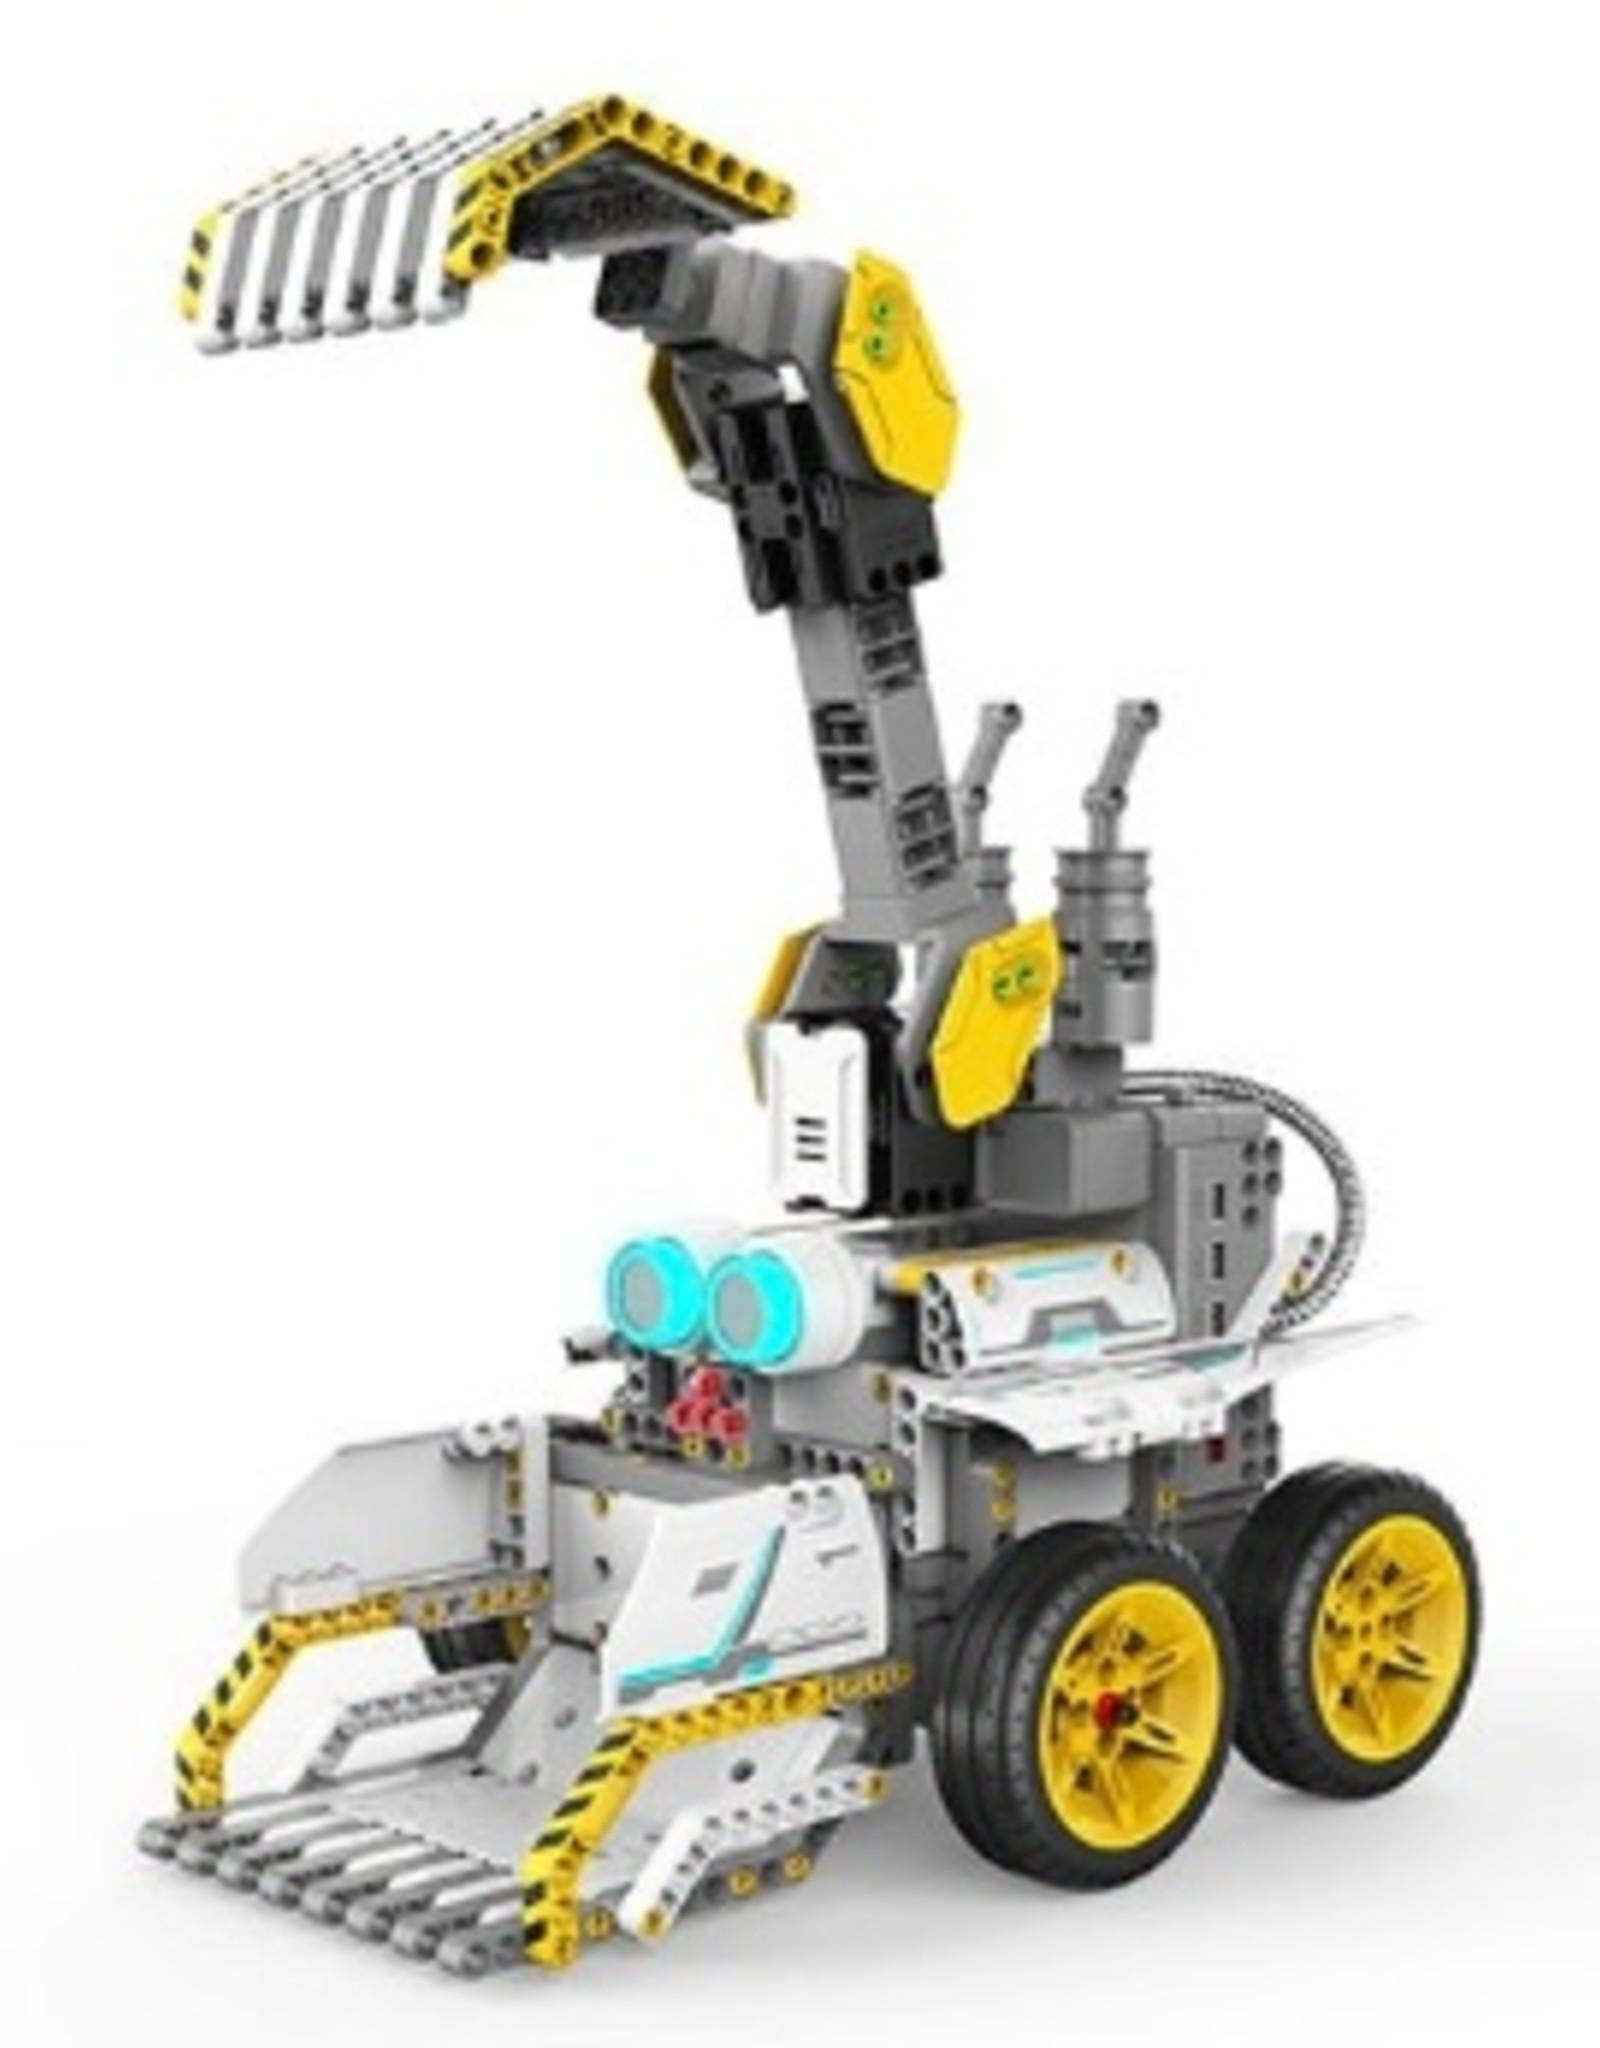 UBtech | Jimu Robot BuilderBots Series: OverDrive Kit | JRA0204